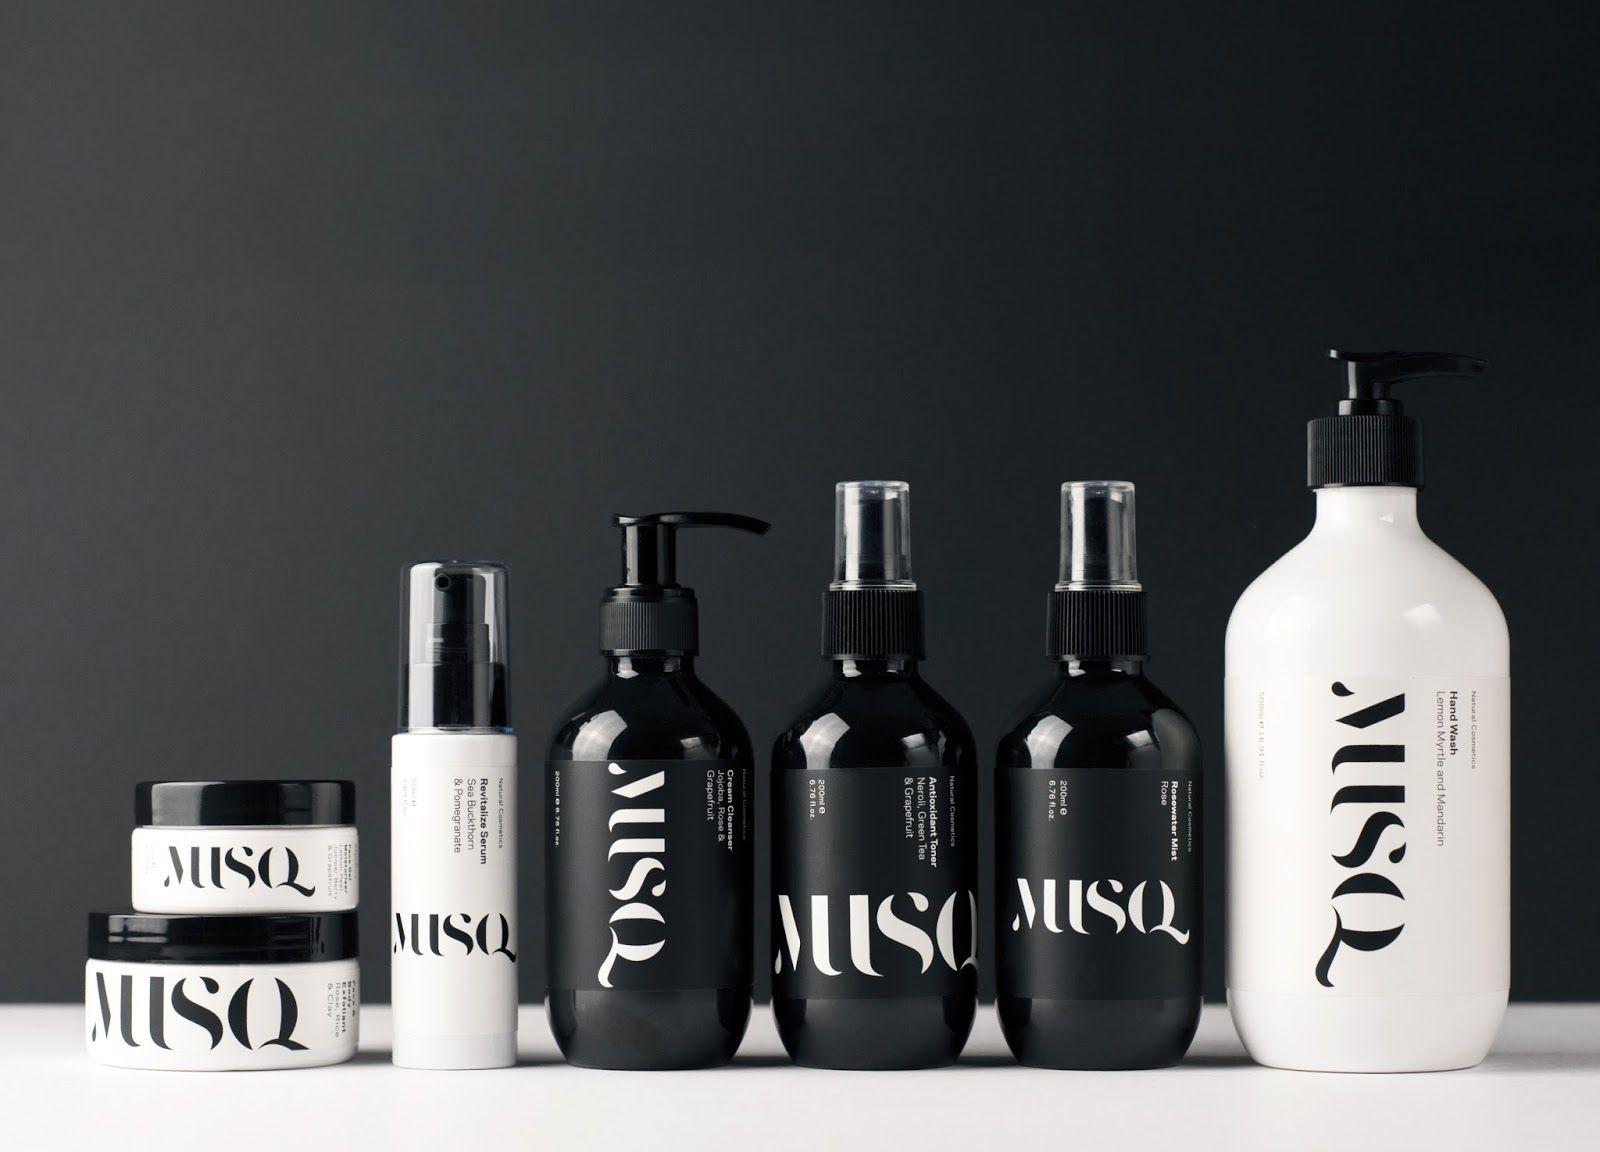 vintage cosemtic brand skincare에 대한 이미지 검색결과